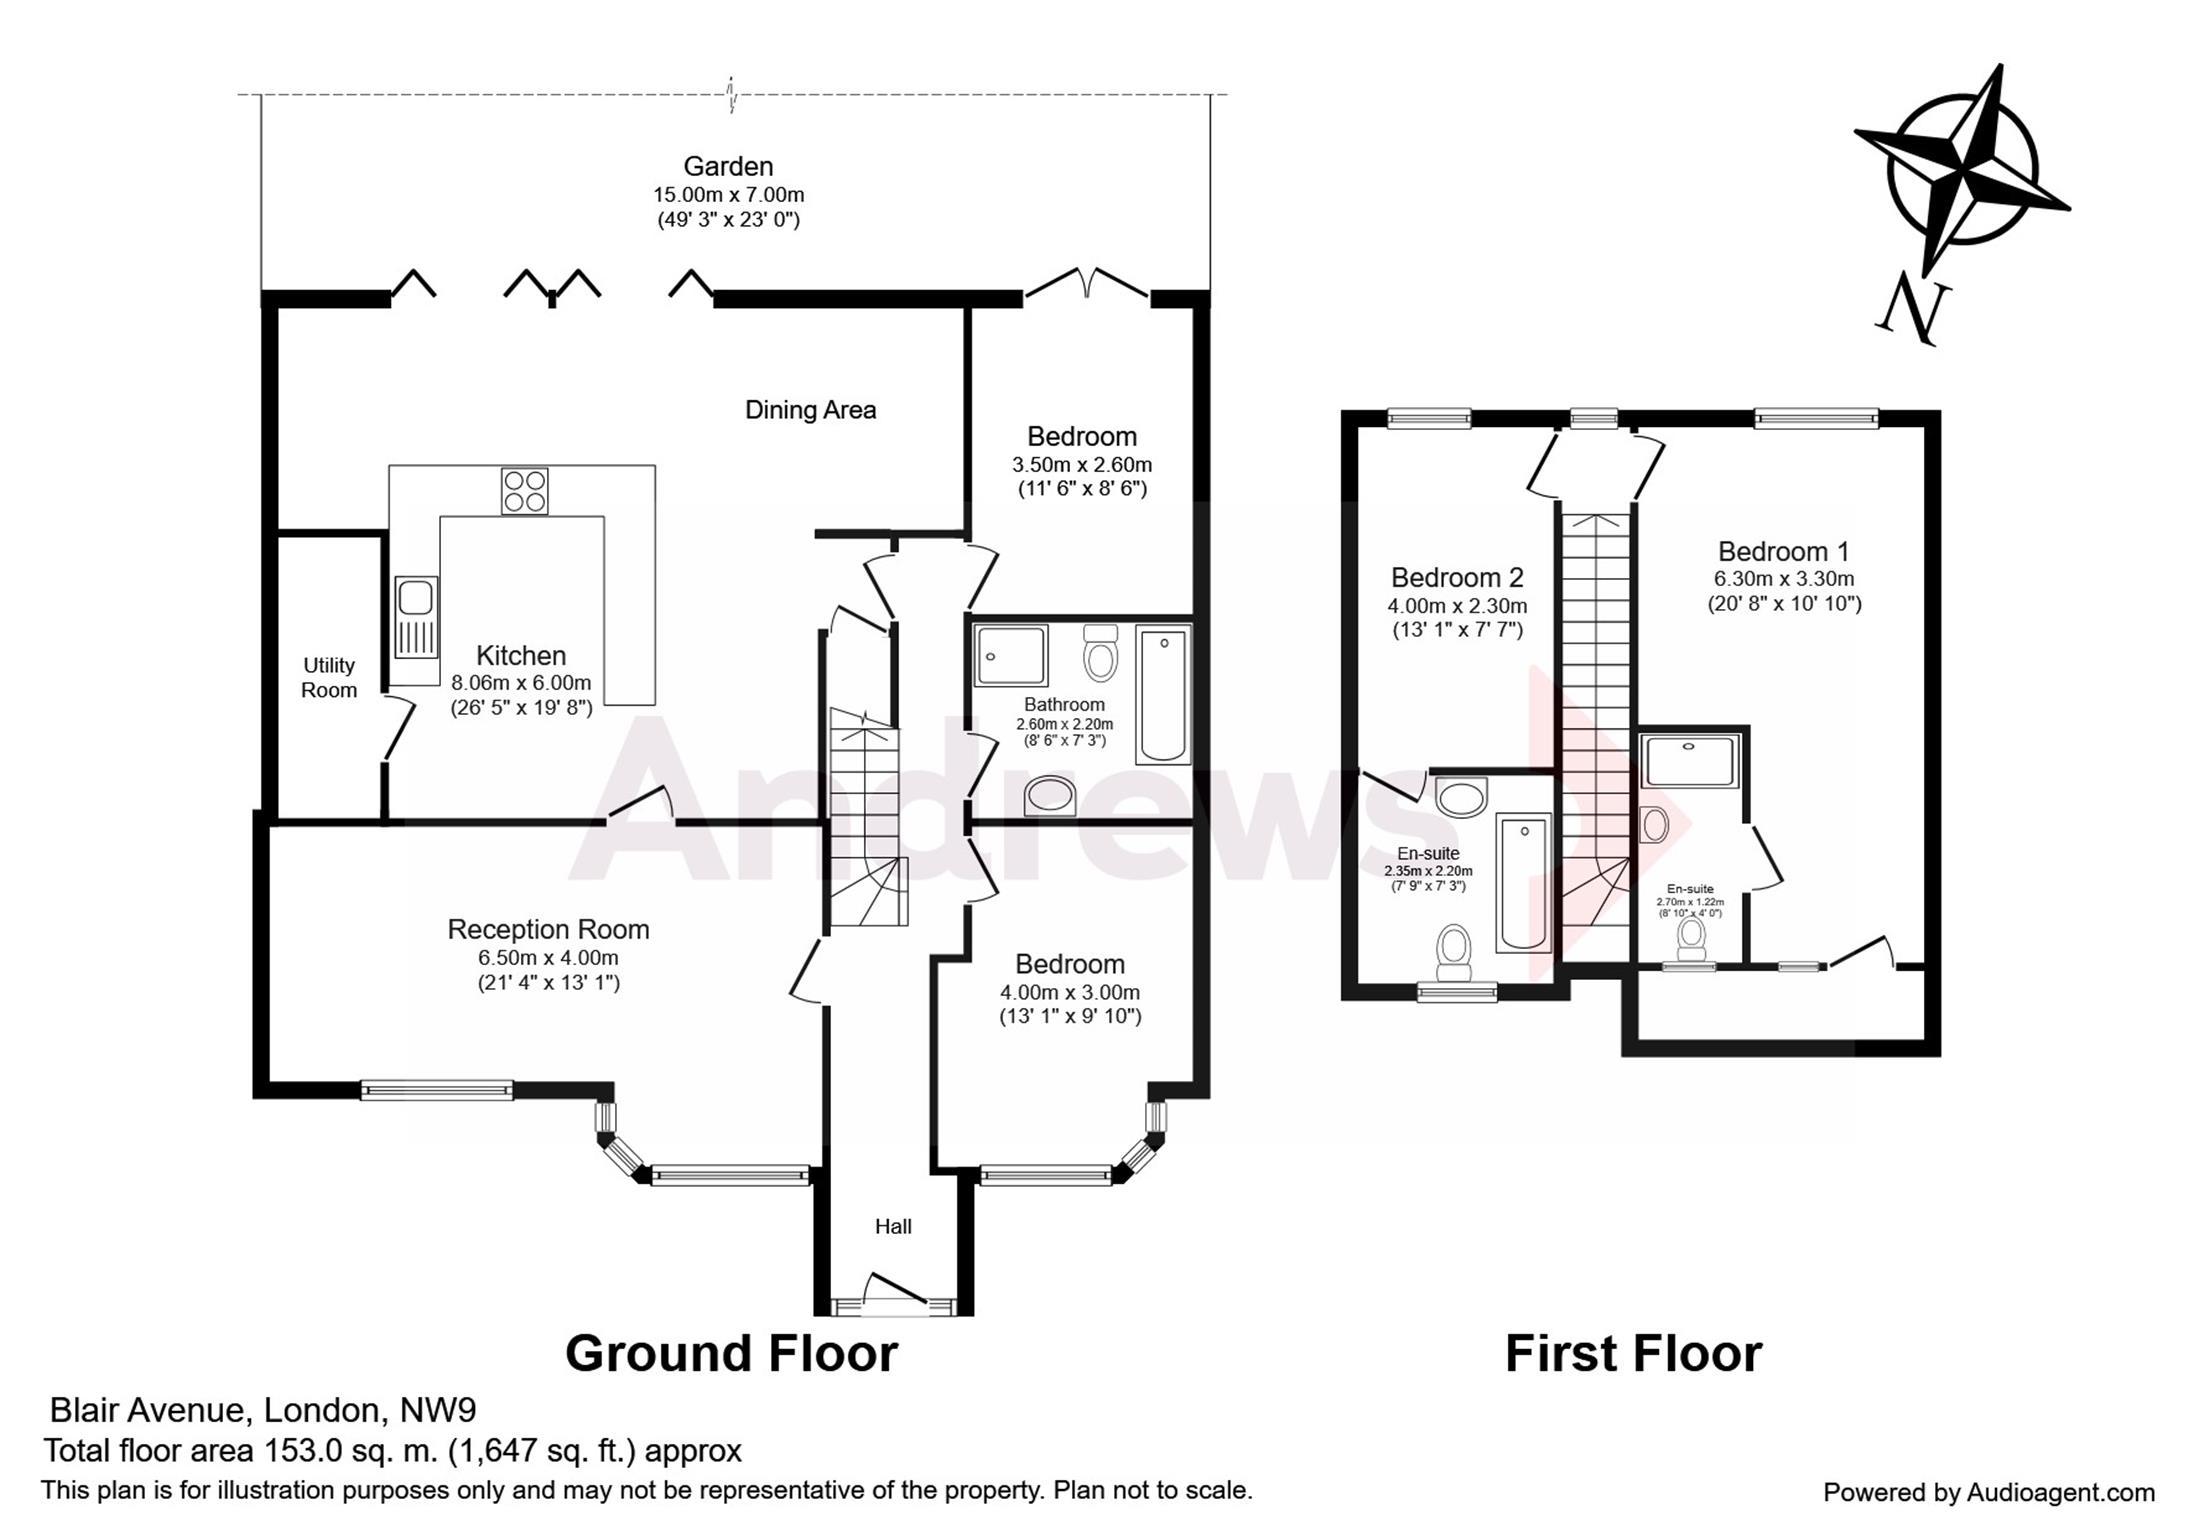 4 Bedrooms Semi-detached bungalow for sale in Blair Avenue, Kingsbury NW9